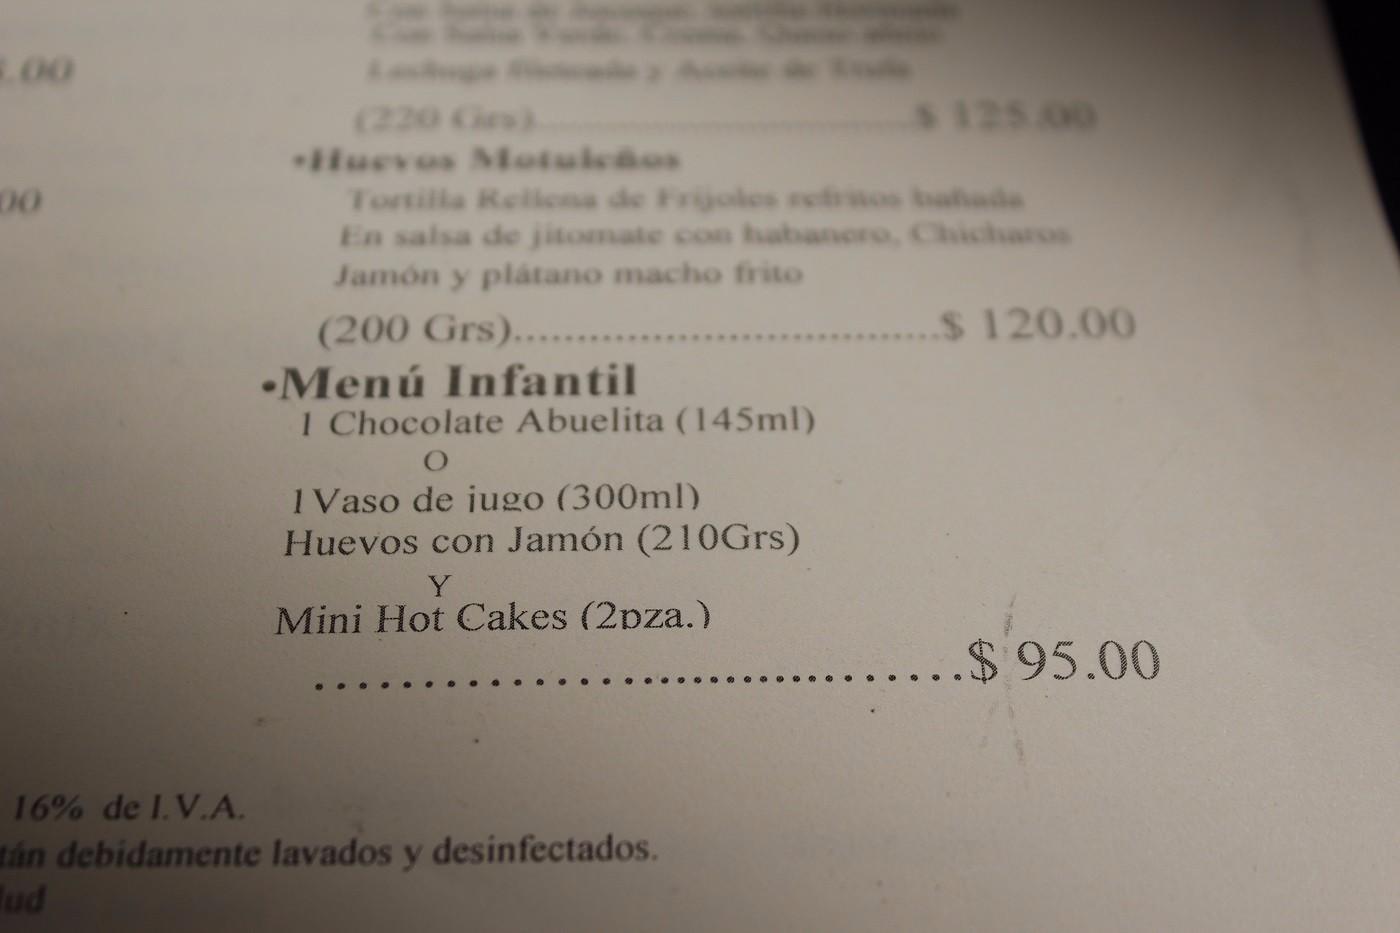 menu-infantil-bonito-popfood-san-angel-momadvisor-1